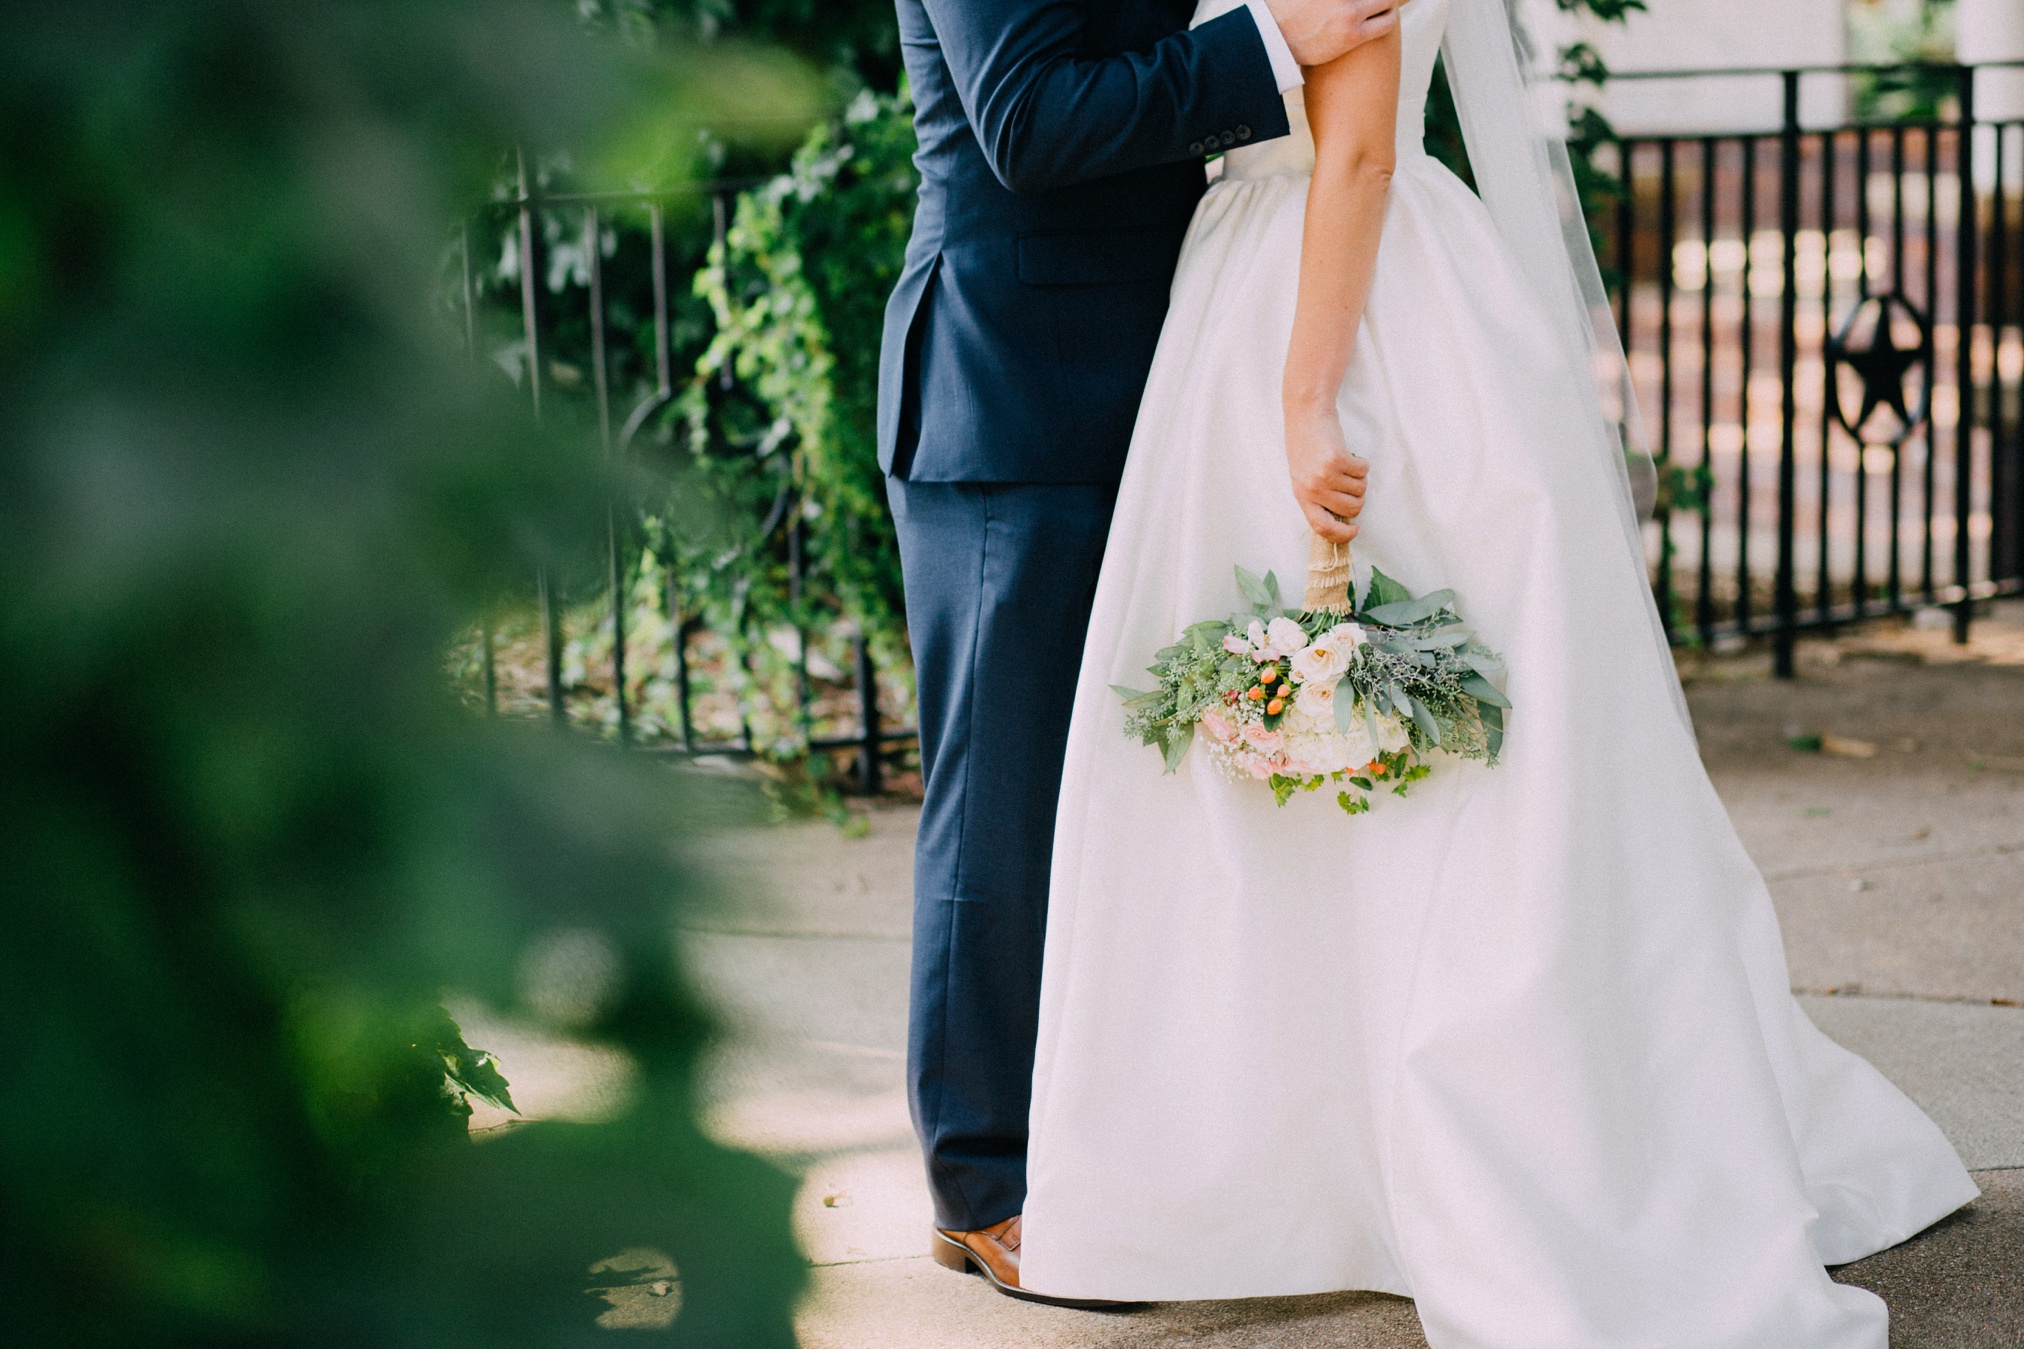 brenna+michael_wedding-270.jpg